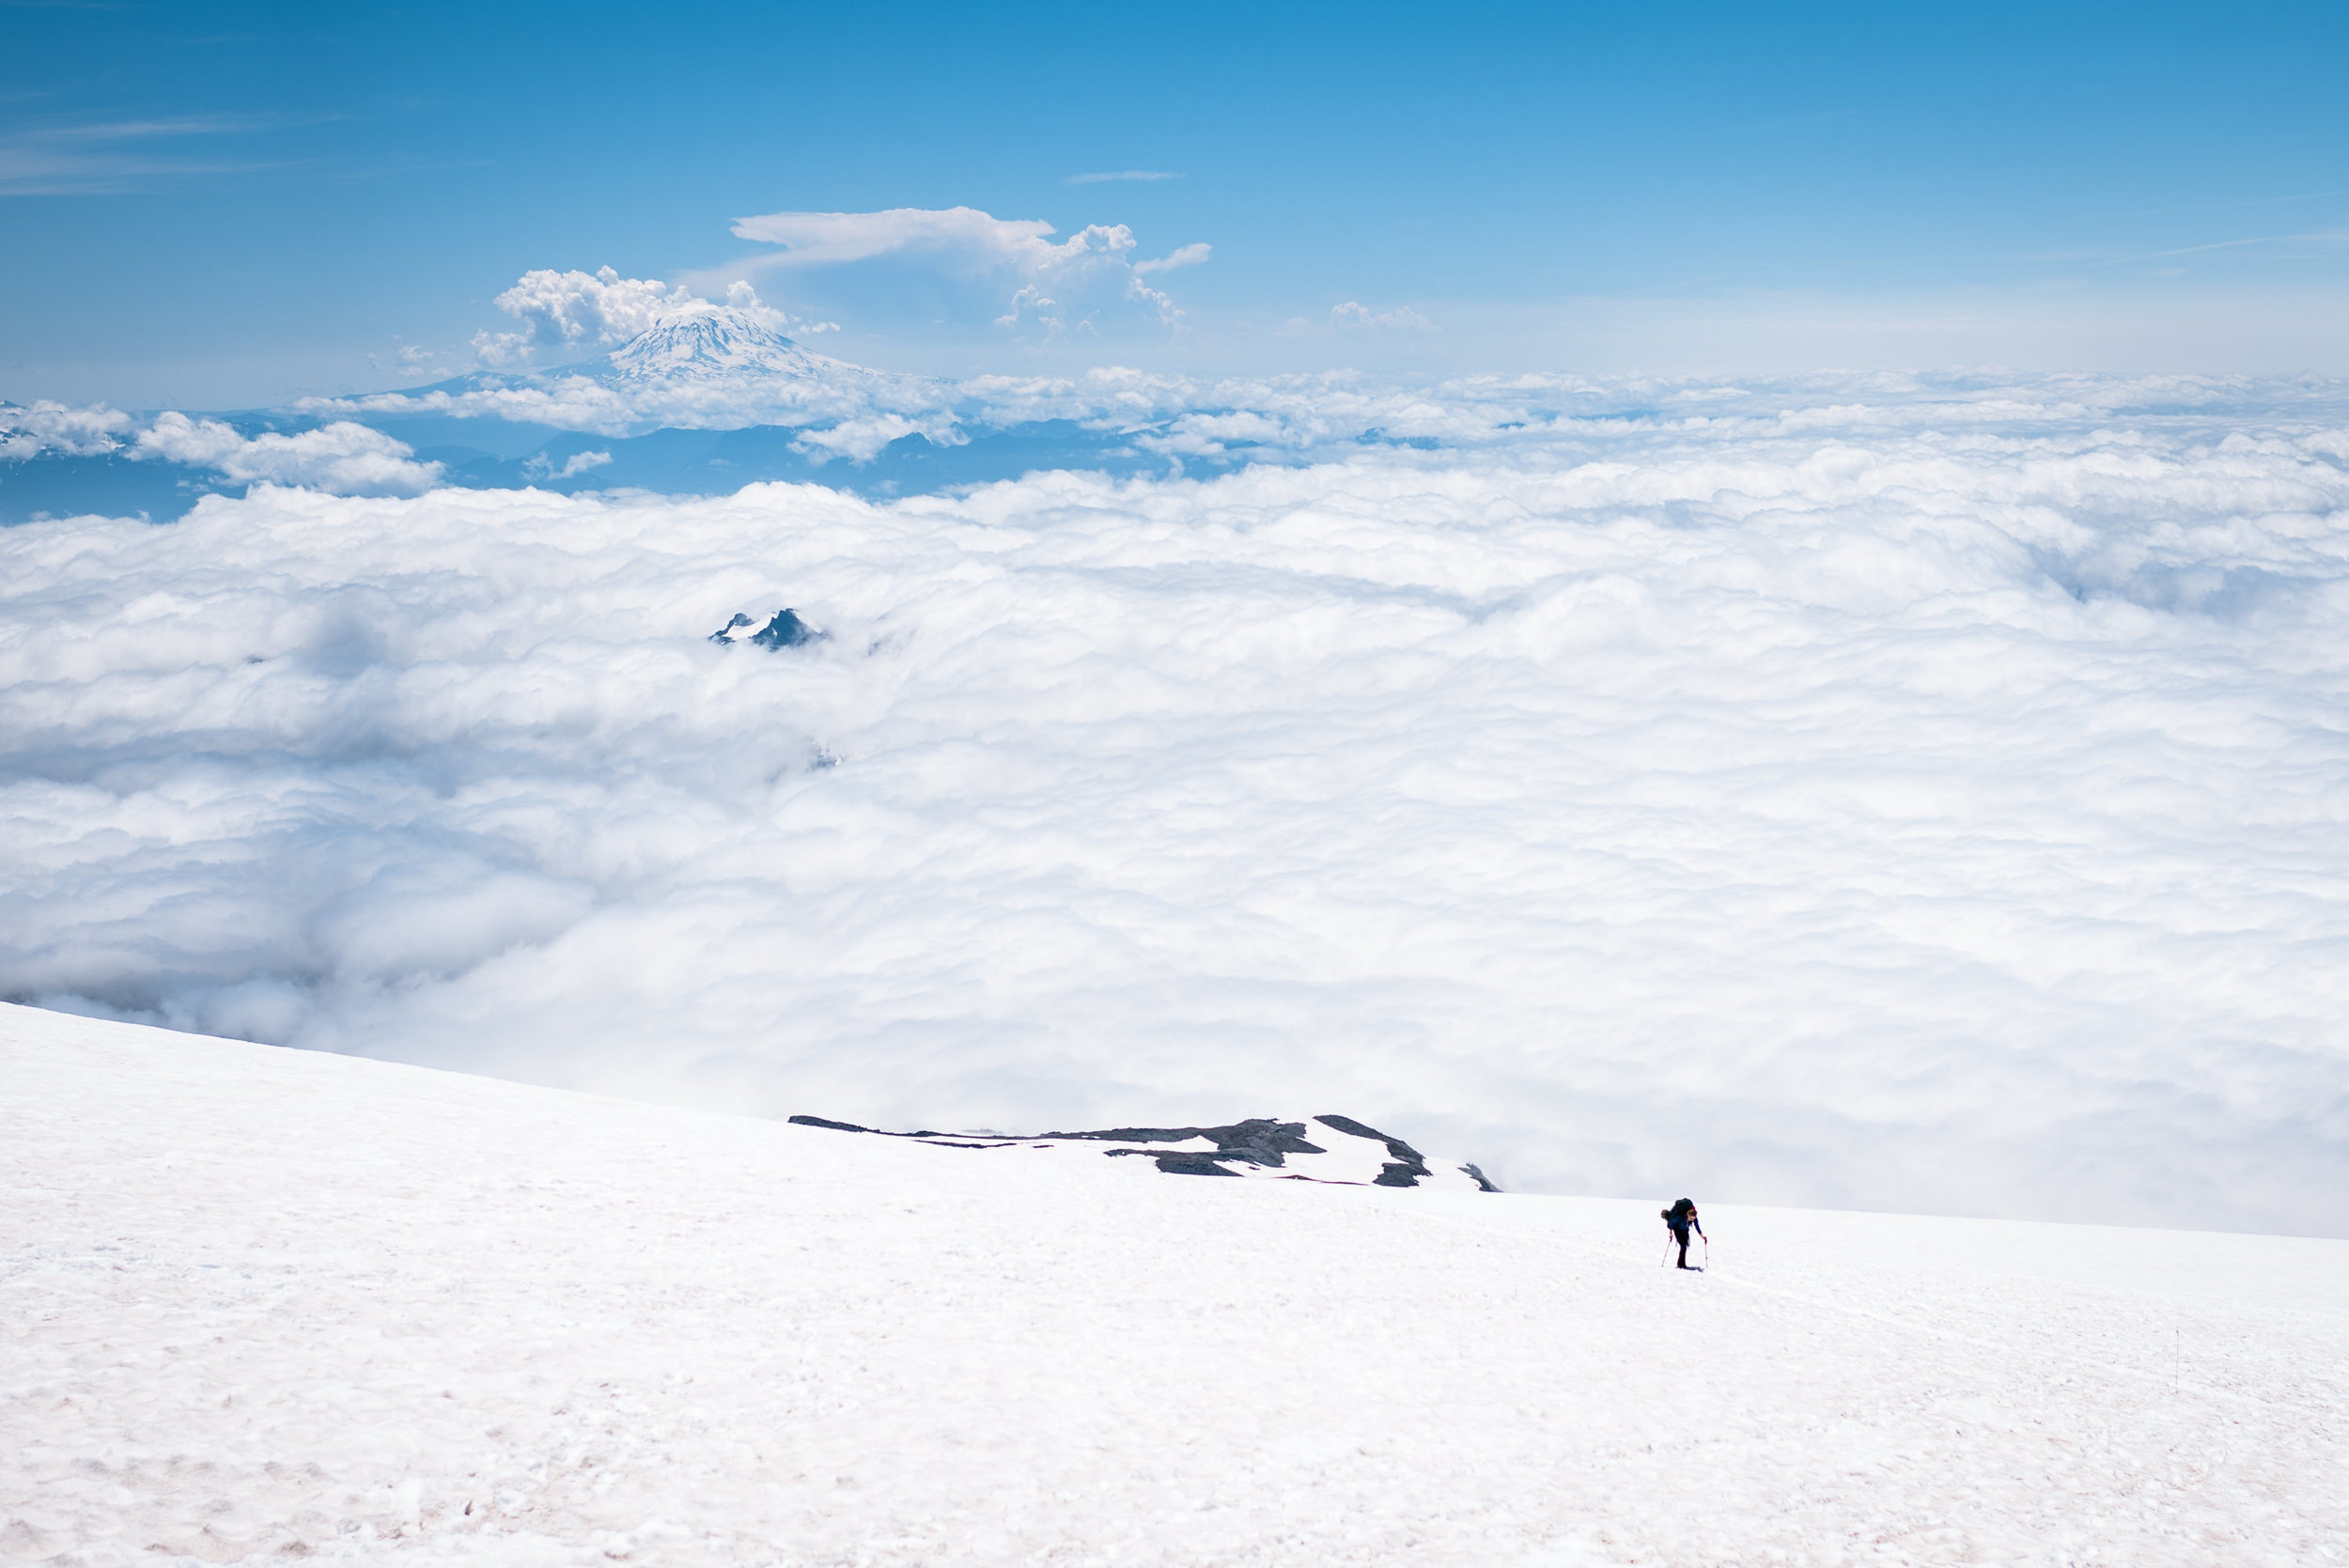 June 21, 2018 - Andrew Tat - Mount Rainier National Park - Mountaineering, Outdoors - 01.JPG